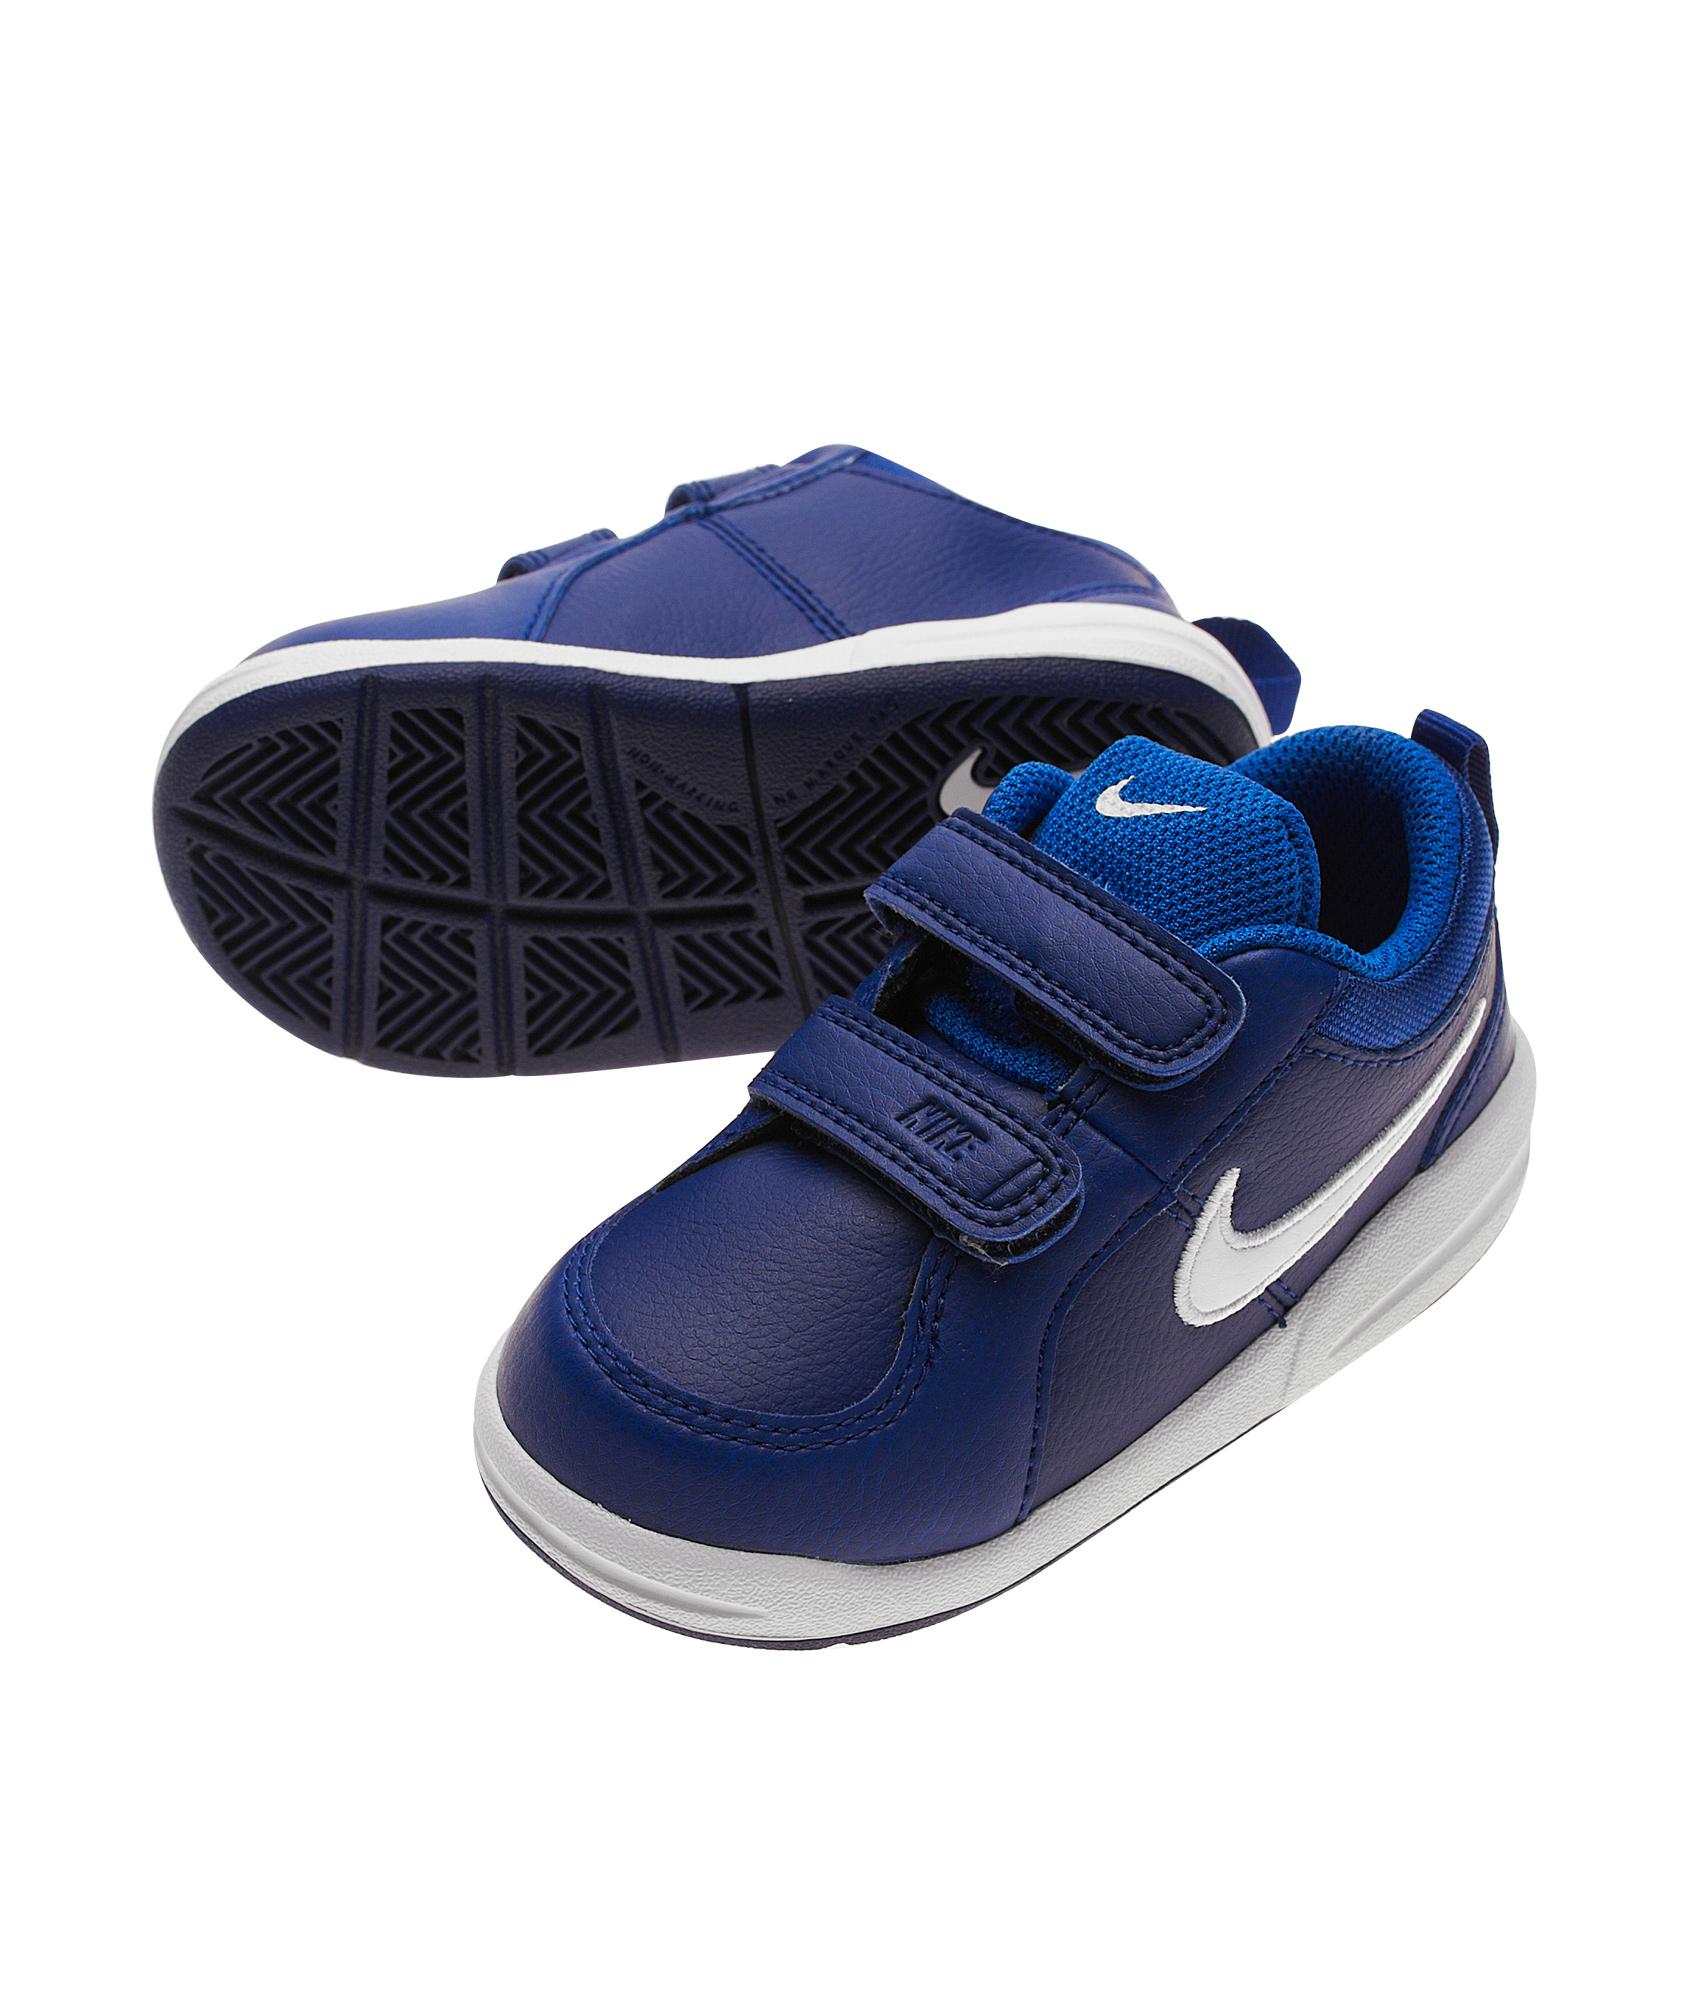 Кроссовки детские Nike Цвет-Синий кроссовки nike кроссовки nike prime hype df 2016 gs